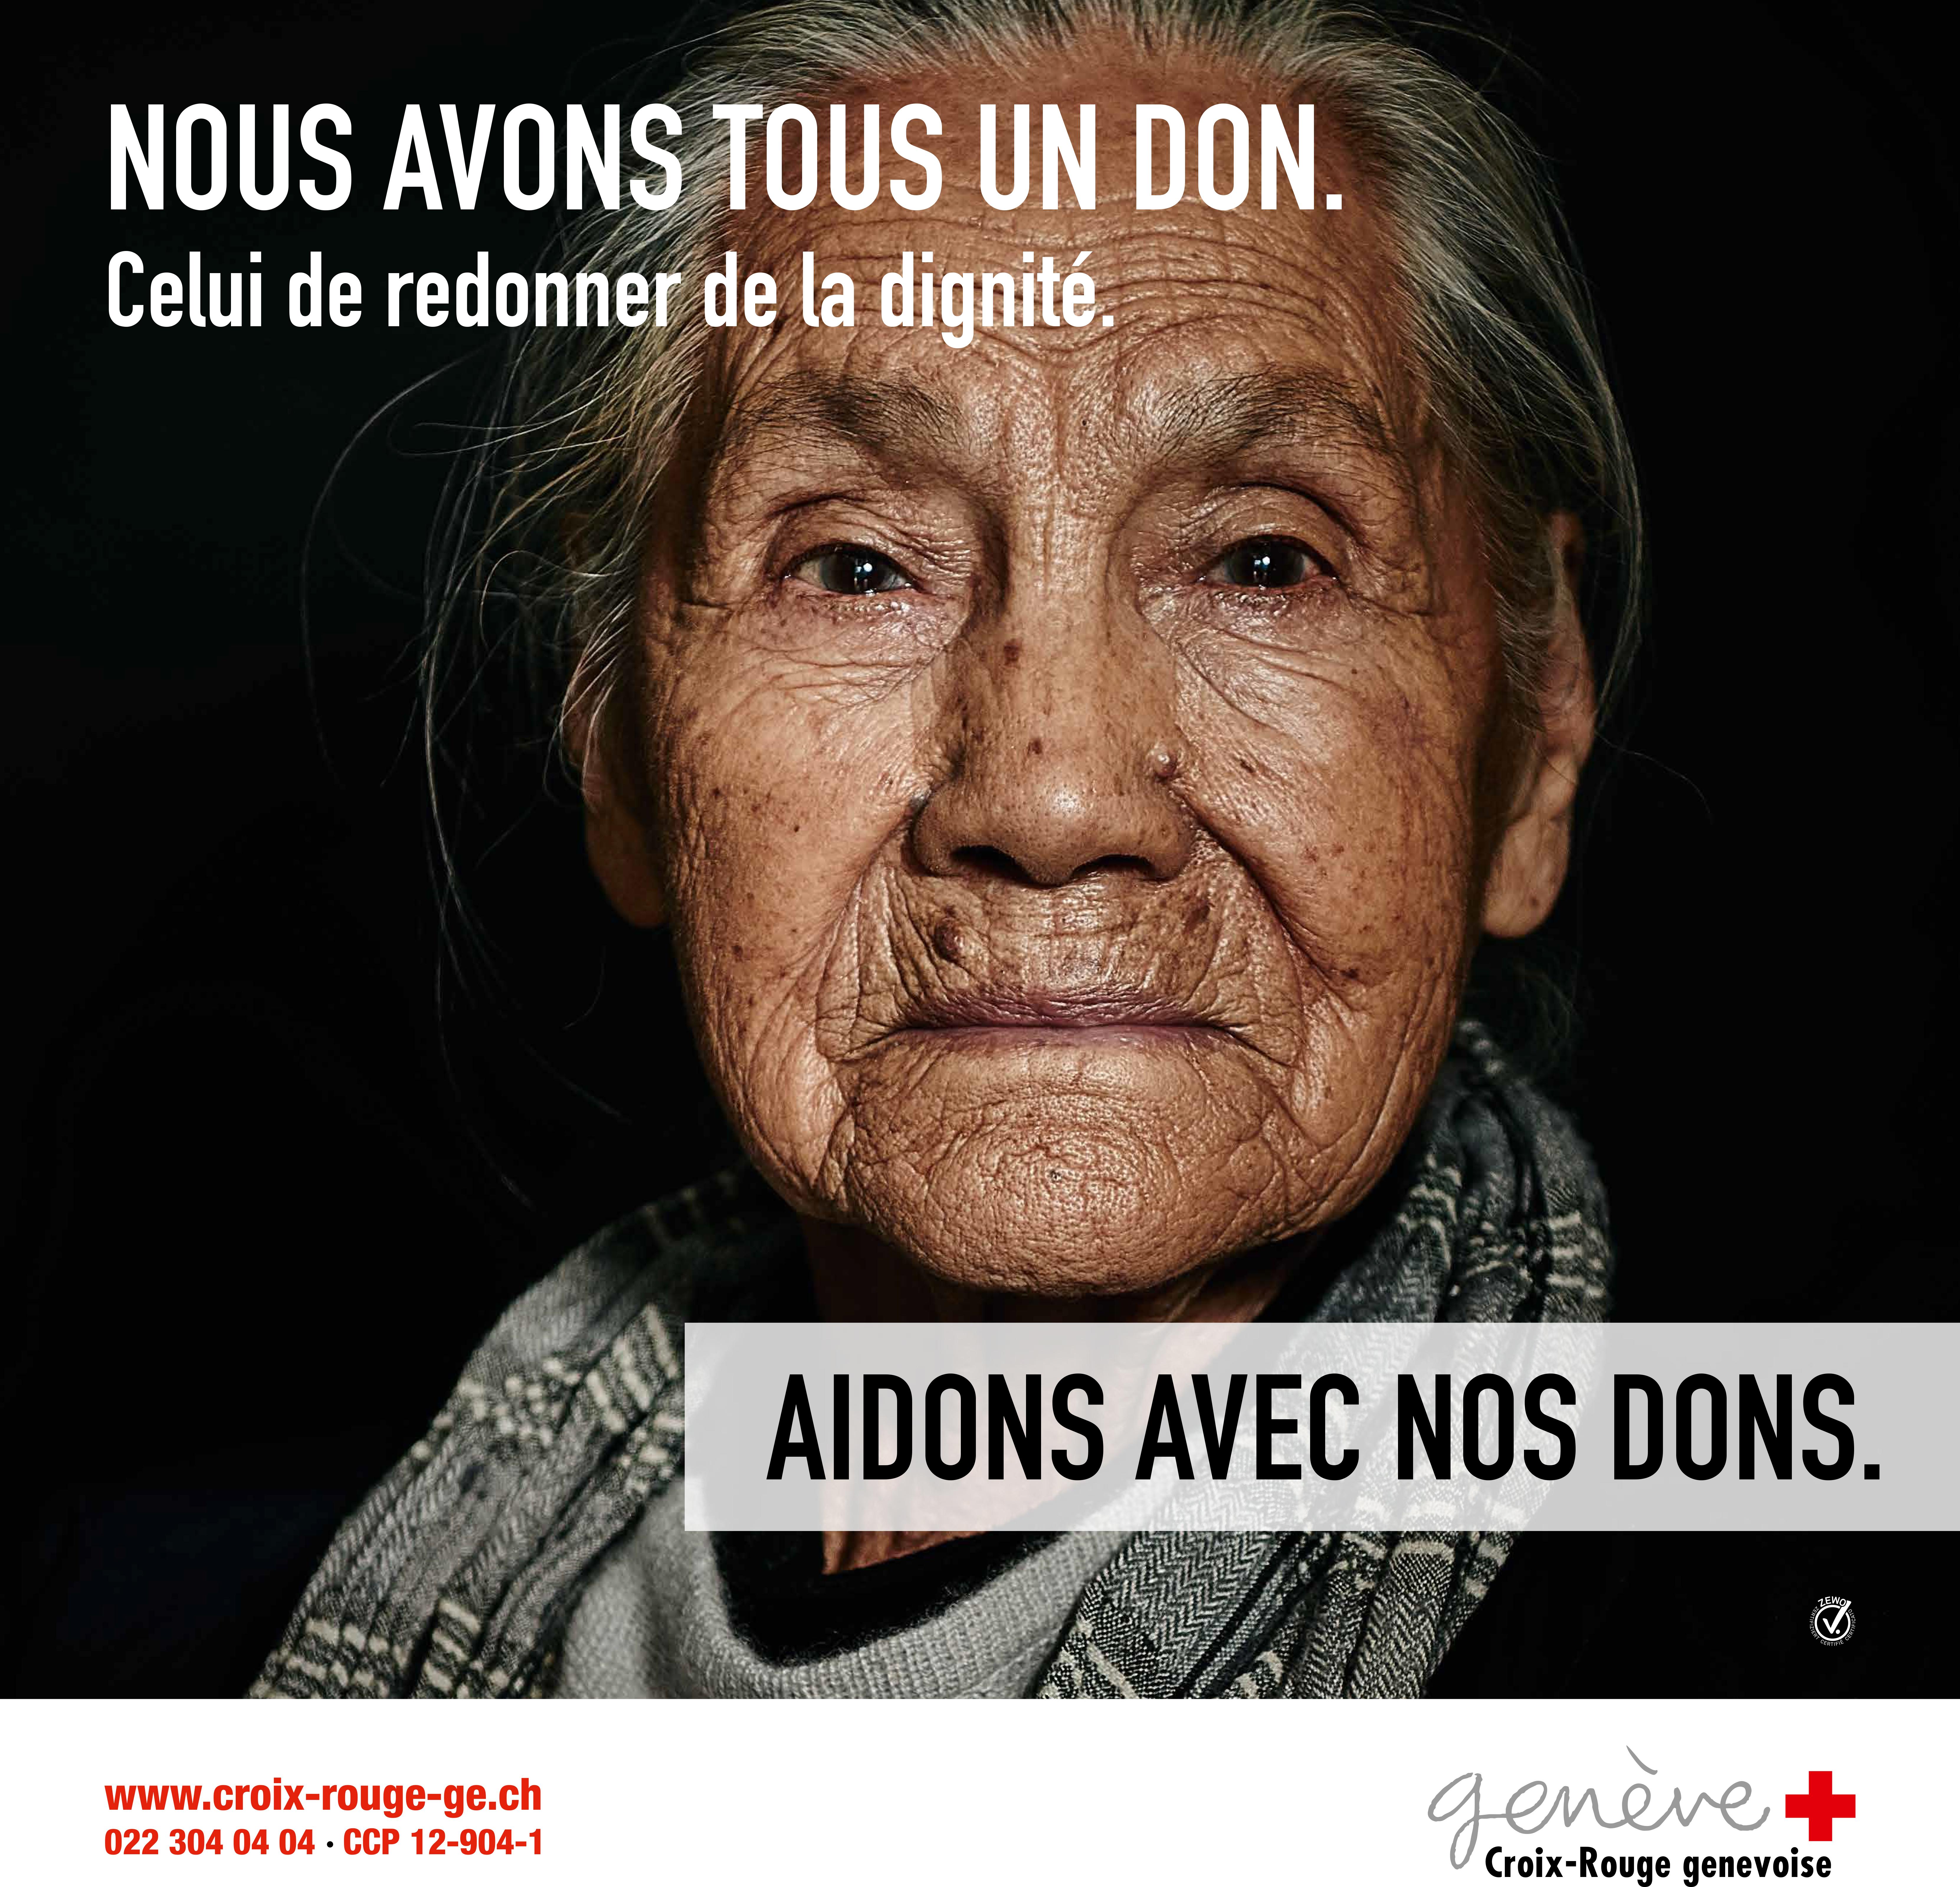 Croix-Rouge Genevoise